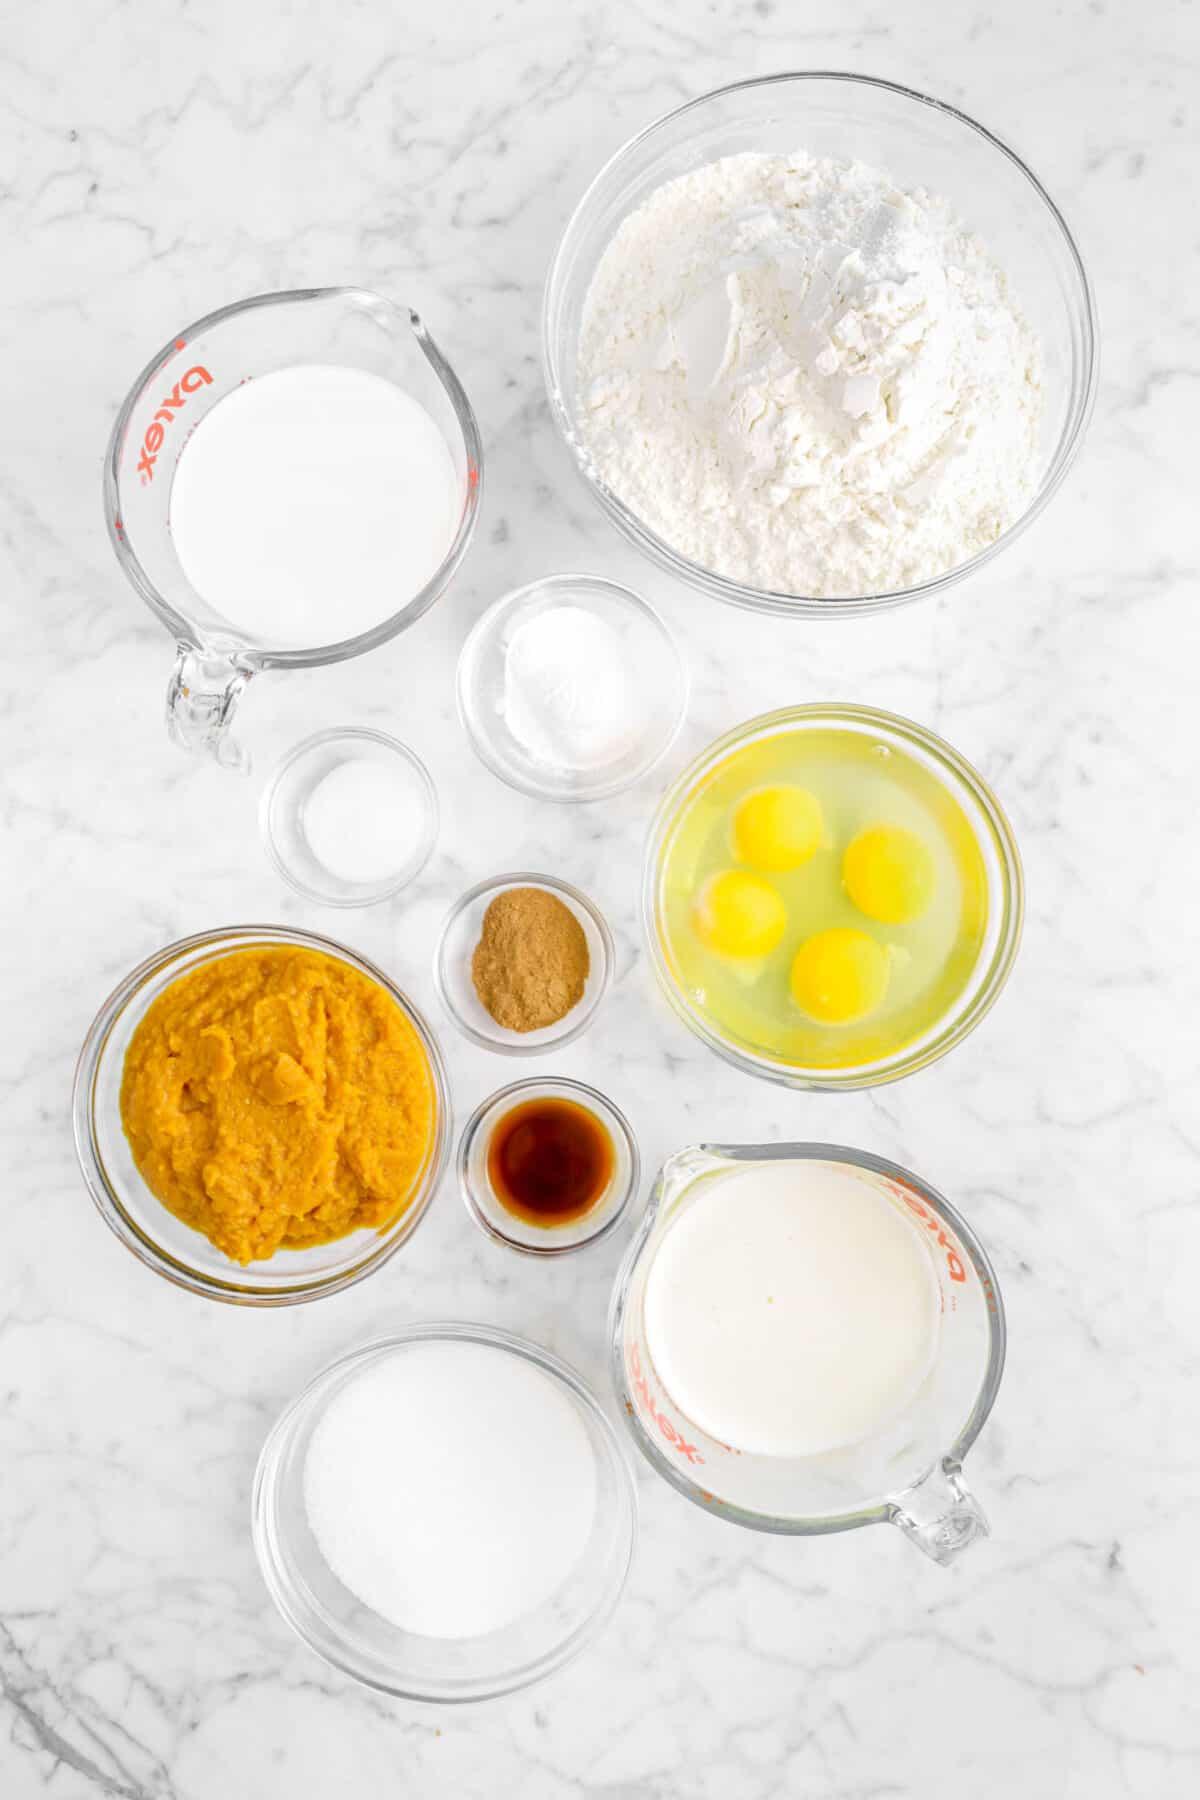 flour, milk, baking powder, salt, spice, eggs, vanilla, pumpkin, sugar, and melted butter on marble counter